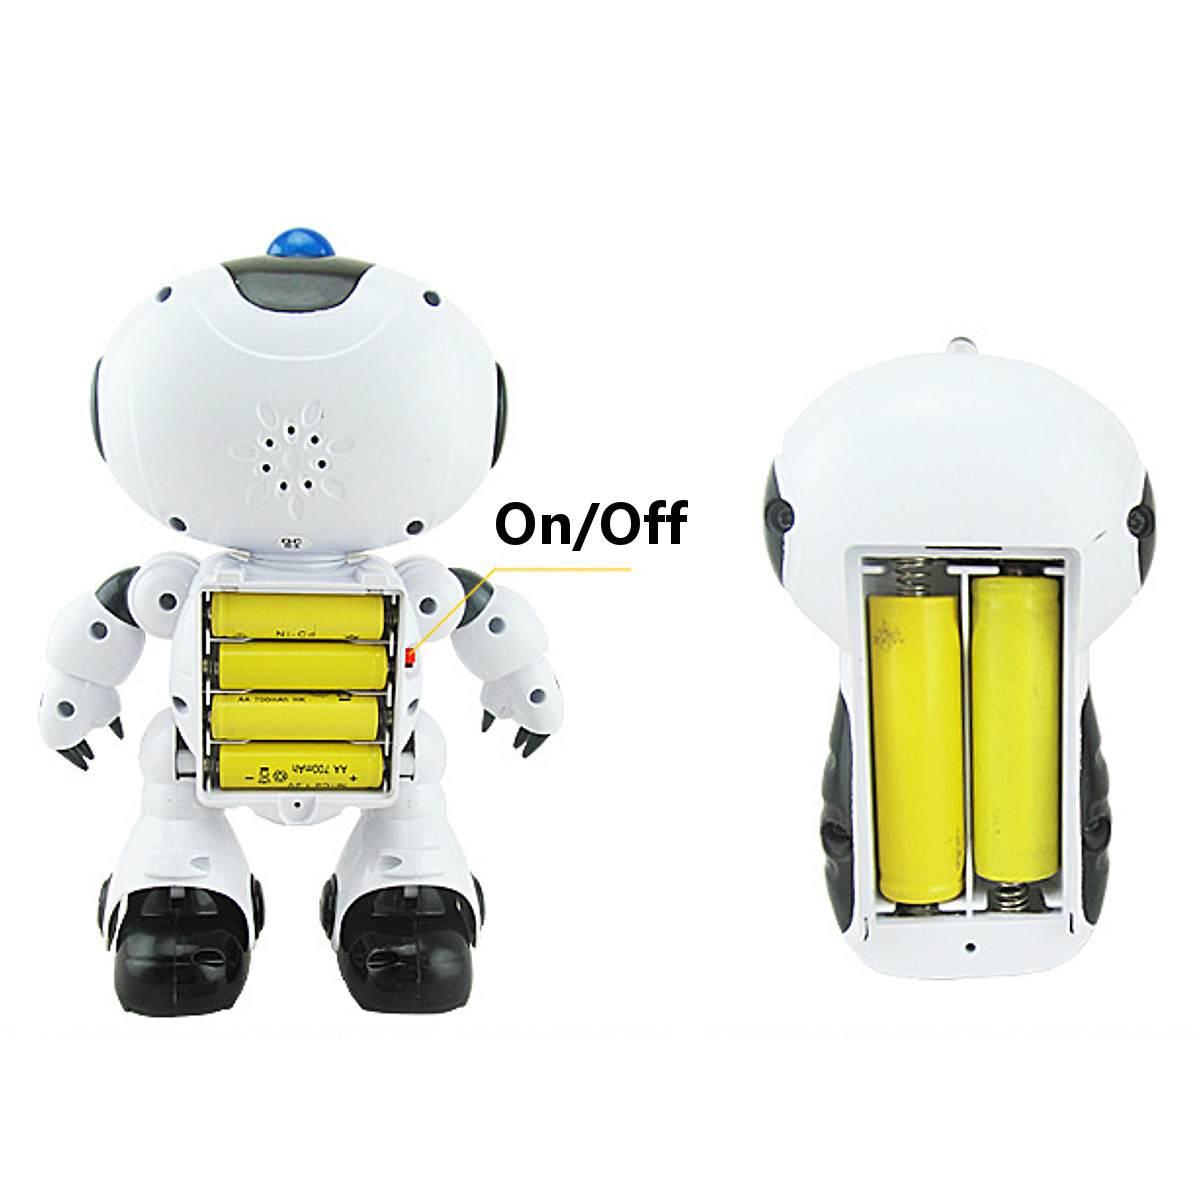 Voice Robot Consumer Electronics Rc Dance Robot Intelligent Programming Remote Control Robotica Toy Humanoid Robot For Children Kids Birthday Gift Present